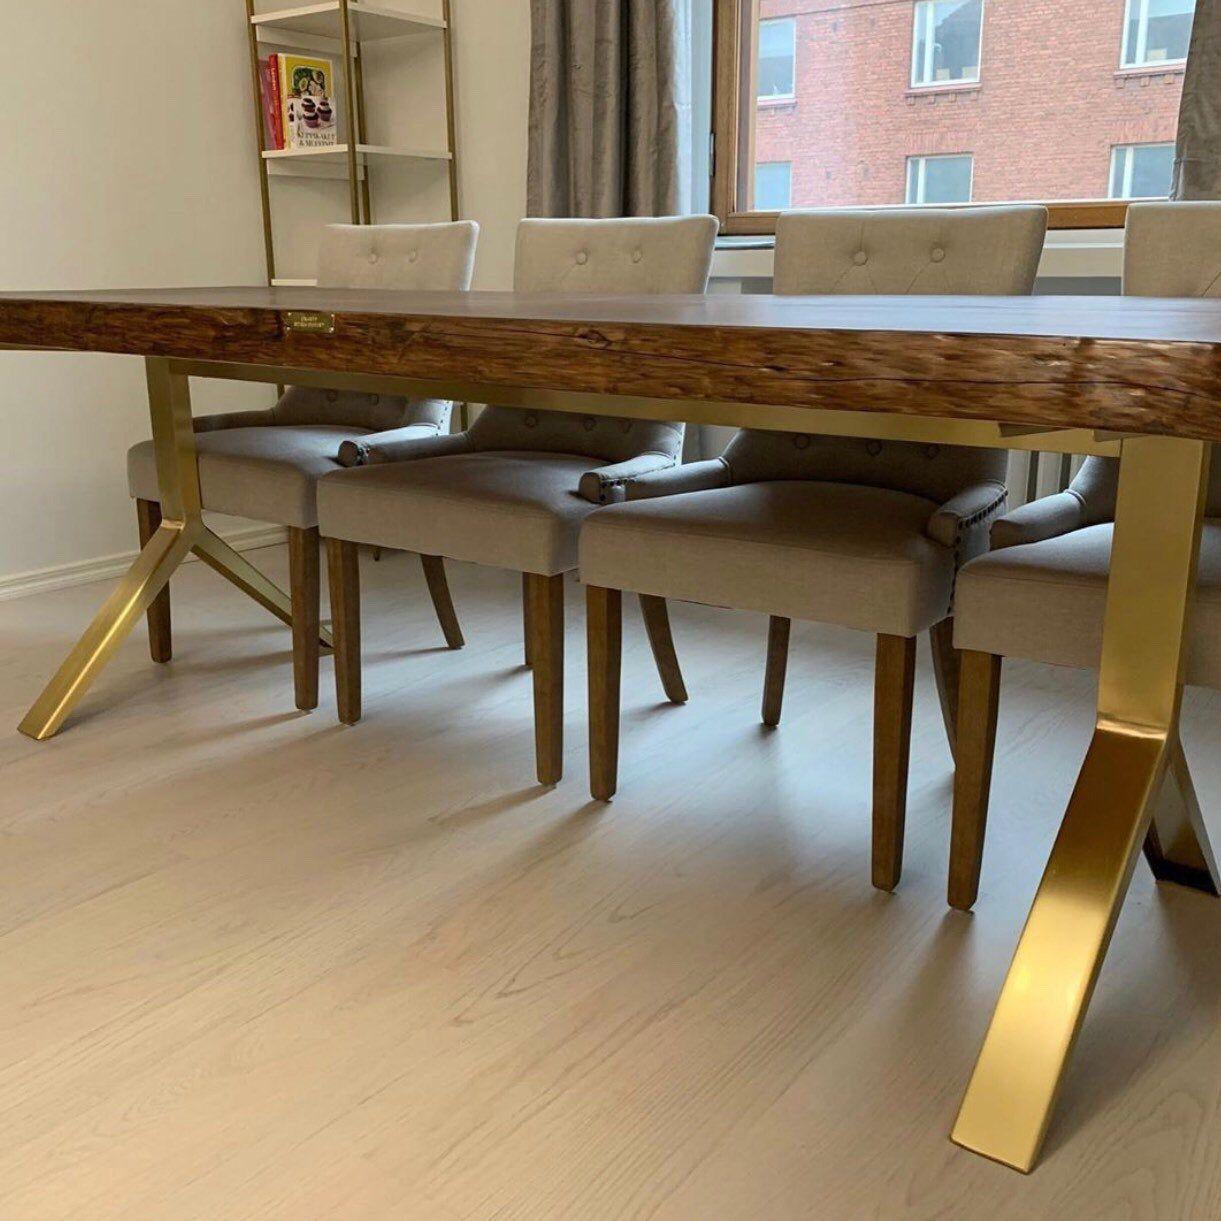 "Modern Dining Table Legs , 28"" H X 28"" W - Apart 42"" CATAL ..."